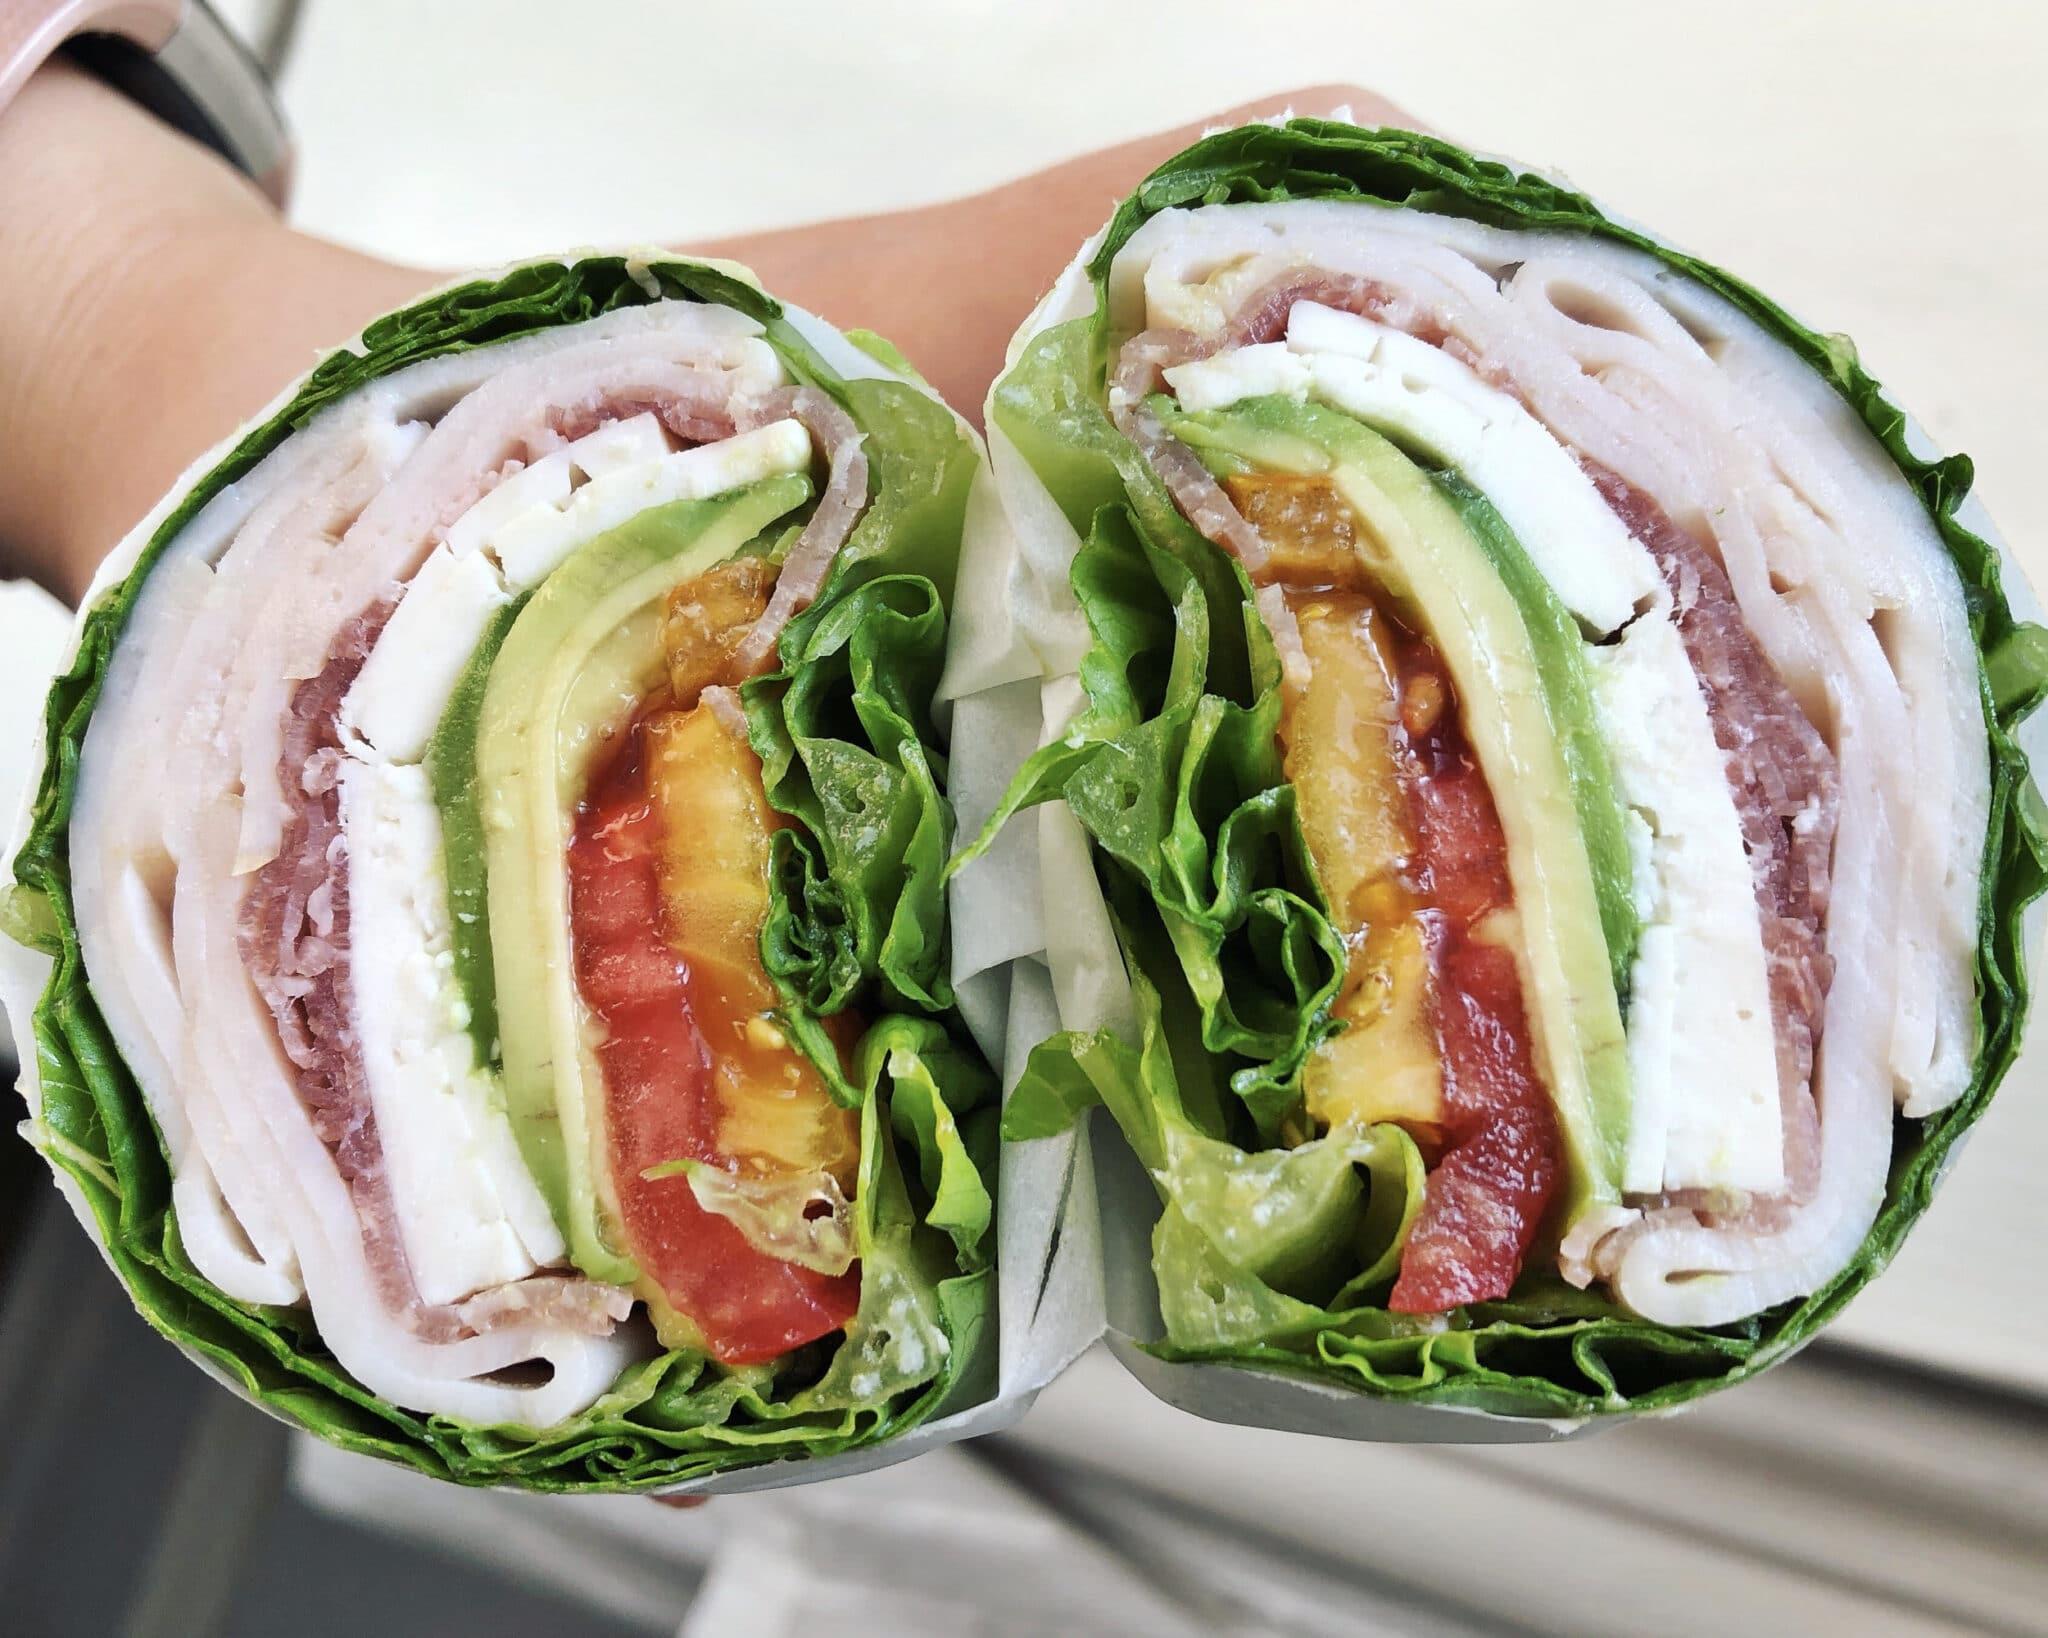 Side view of a low carb lettuce wrap sandwich